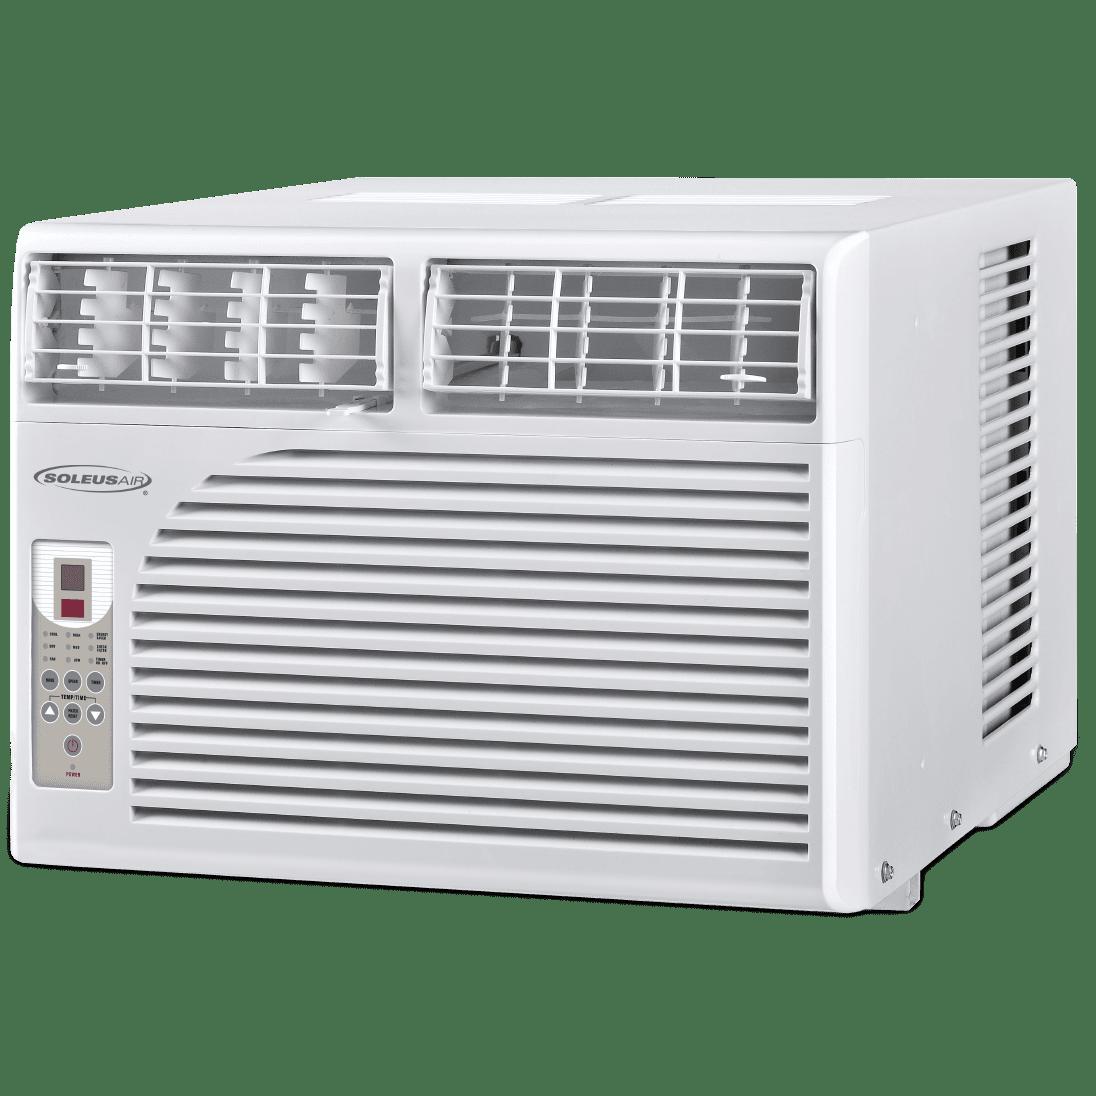 Soleus Air HCC W08ES A1 Window Air Conditioner